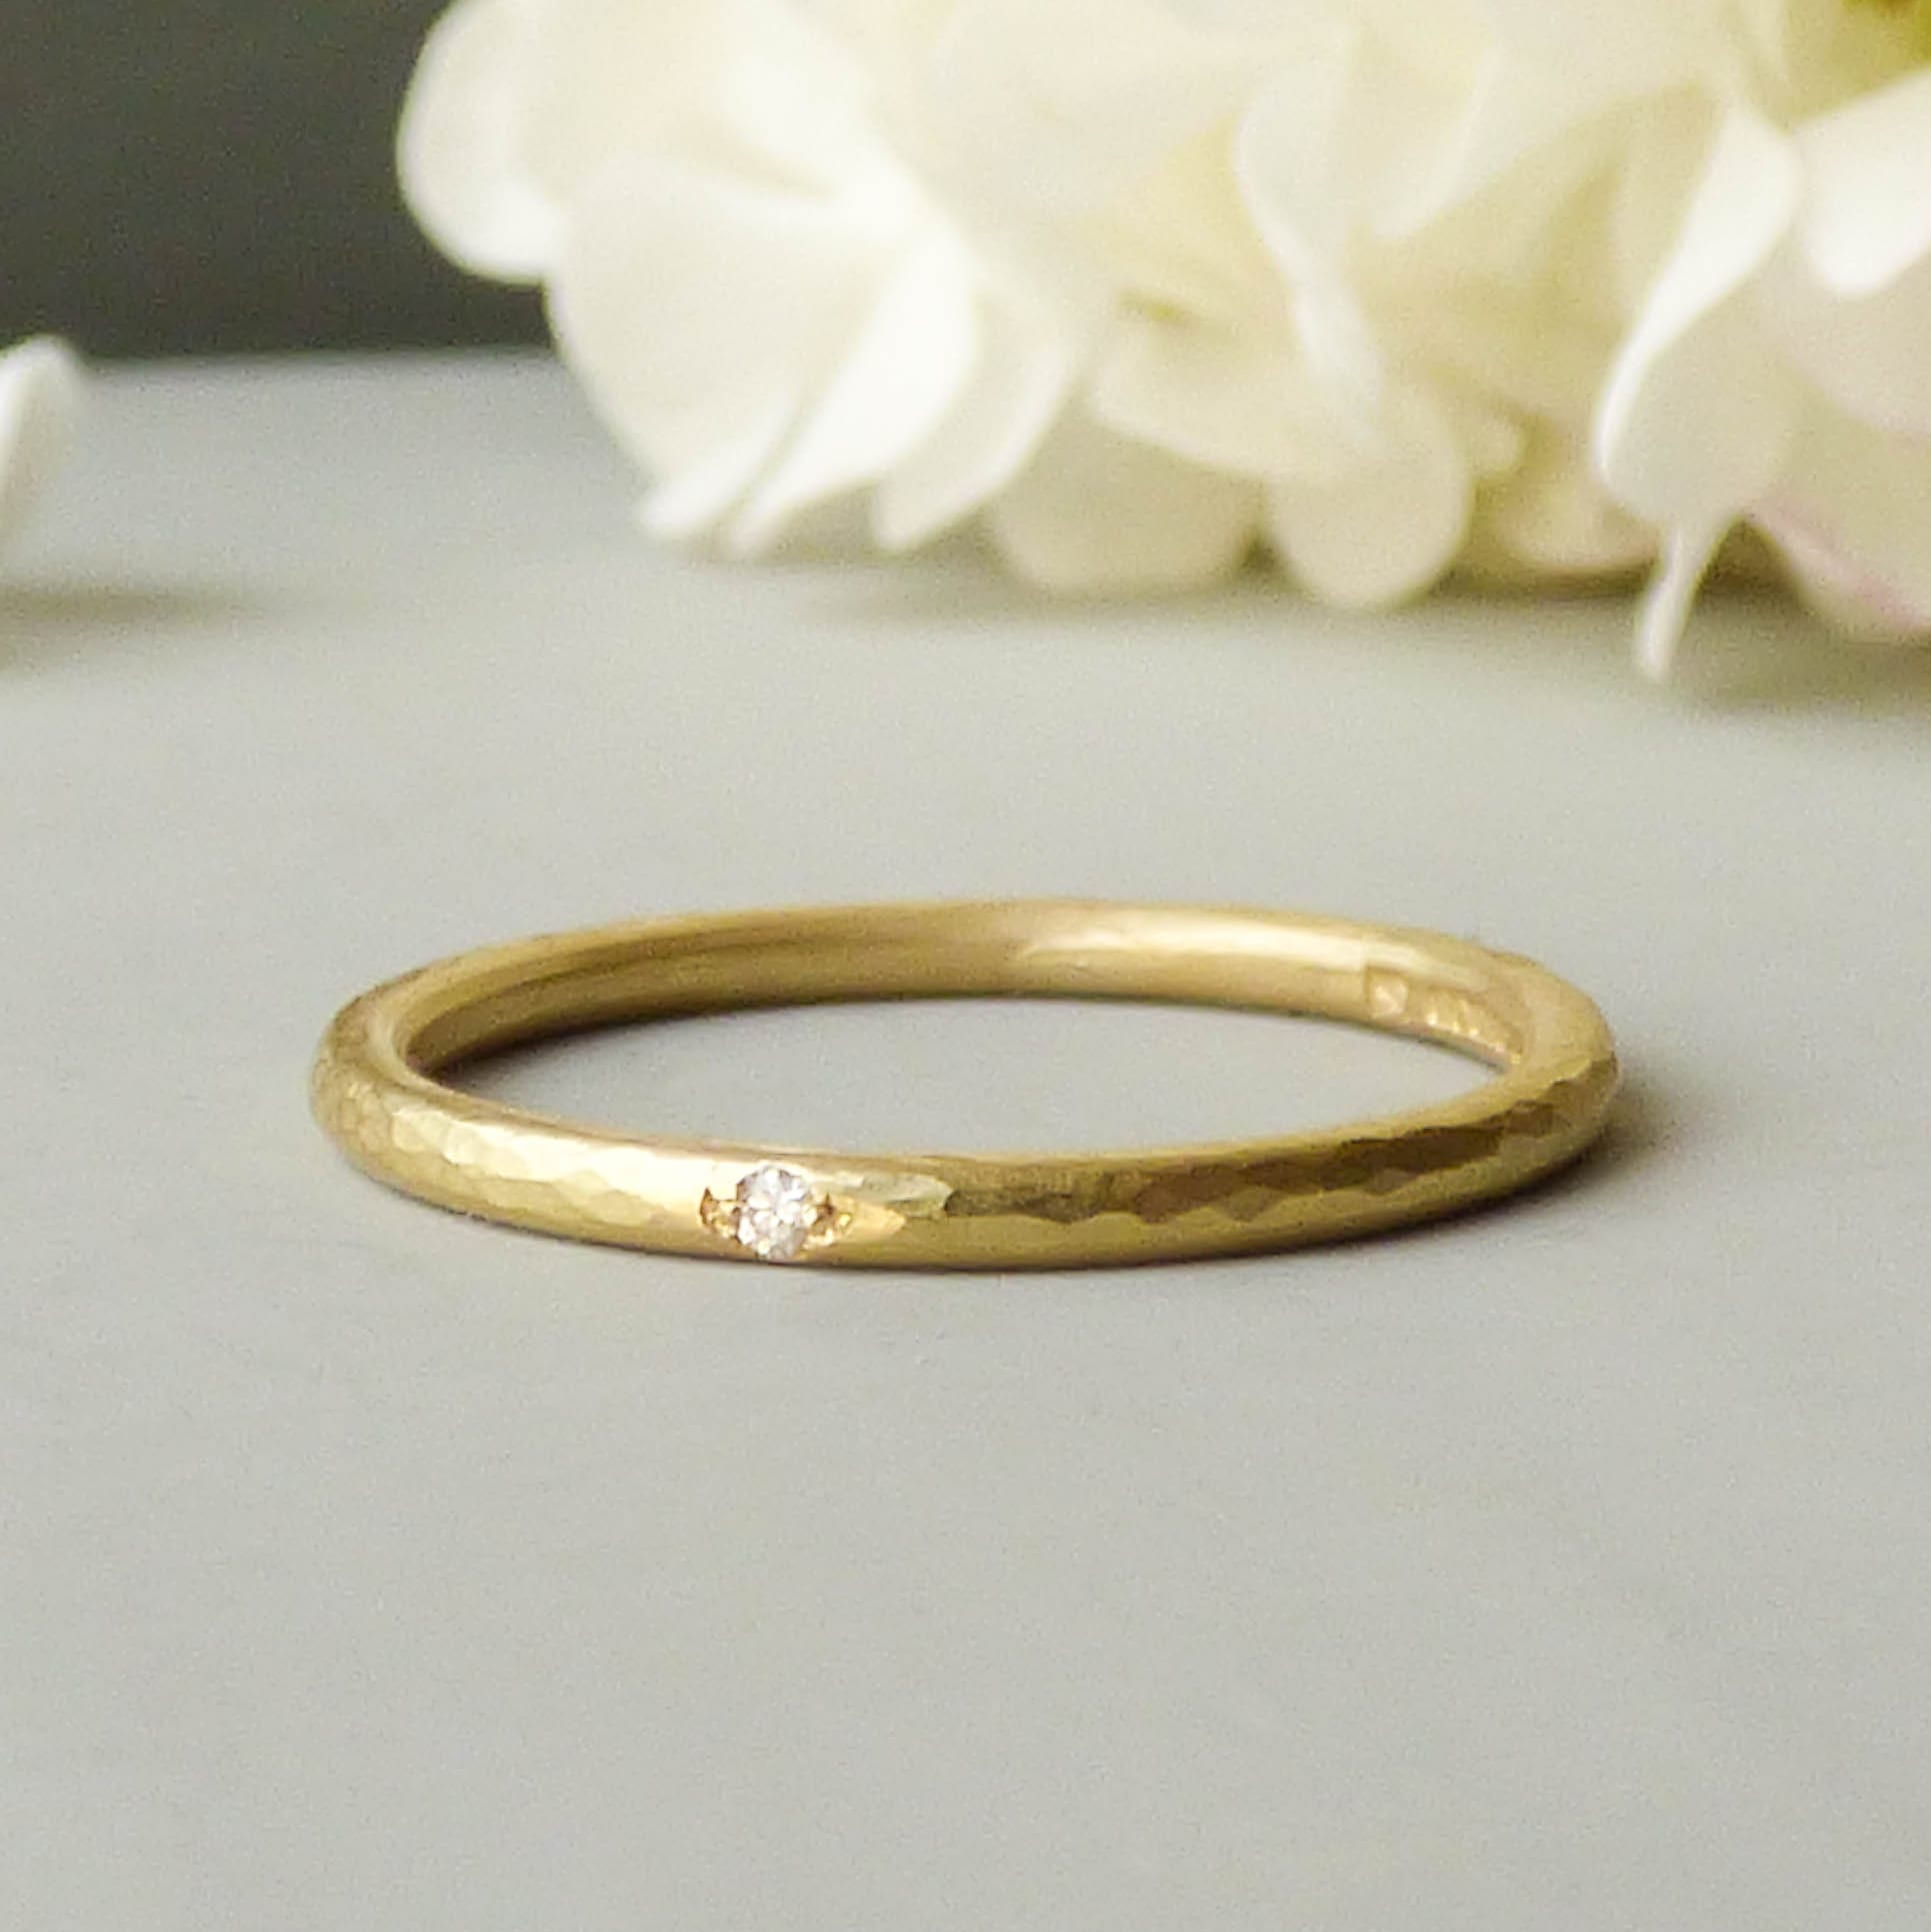 ethical wedding rings harley davidson wedding bands Coco Ethical Wedding Ring In 18ct Fairtrade Gold Shakti Ellenwood